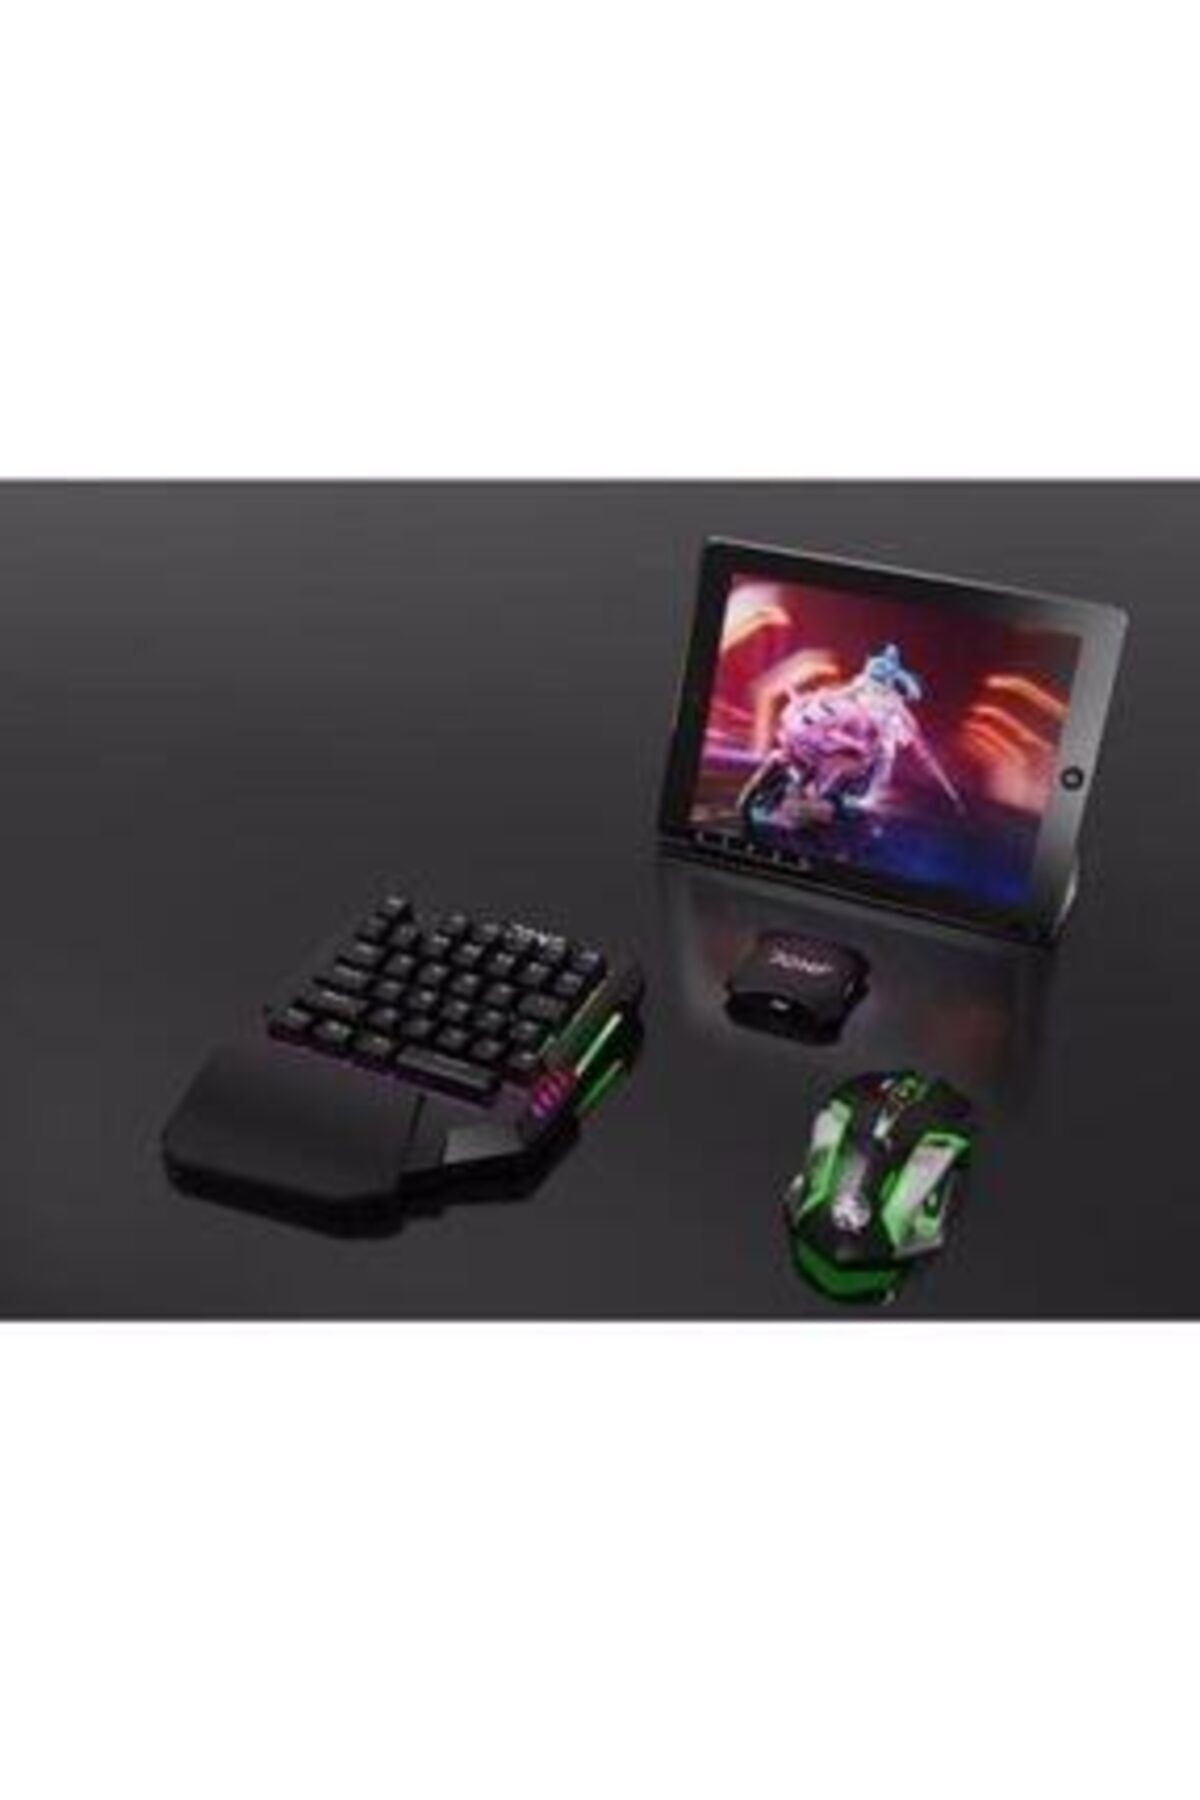 Gate K-snake Pubg Oyun Gaming Klavye K-snake Pubg Oyun Gaming Klavye + Mouse 1